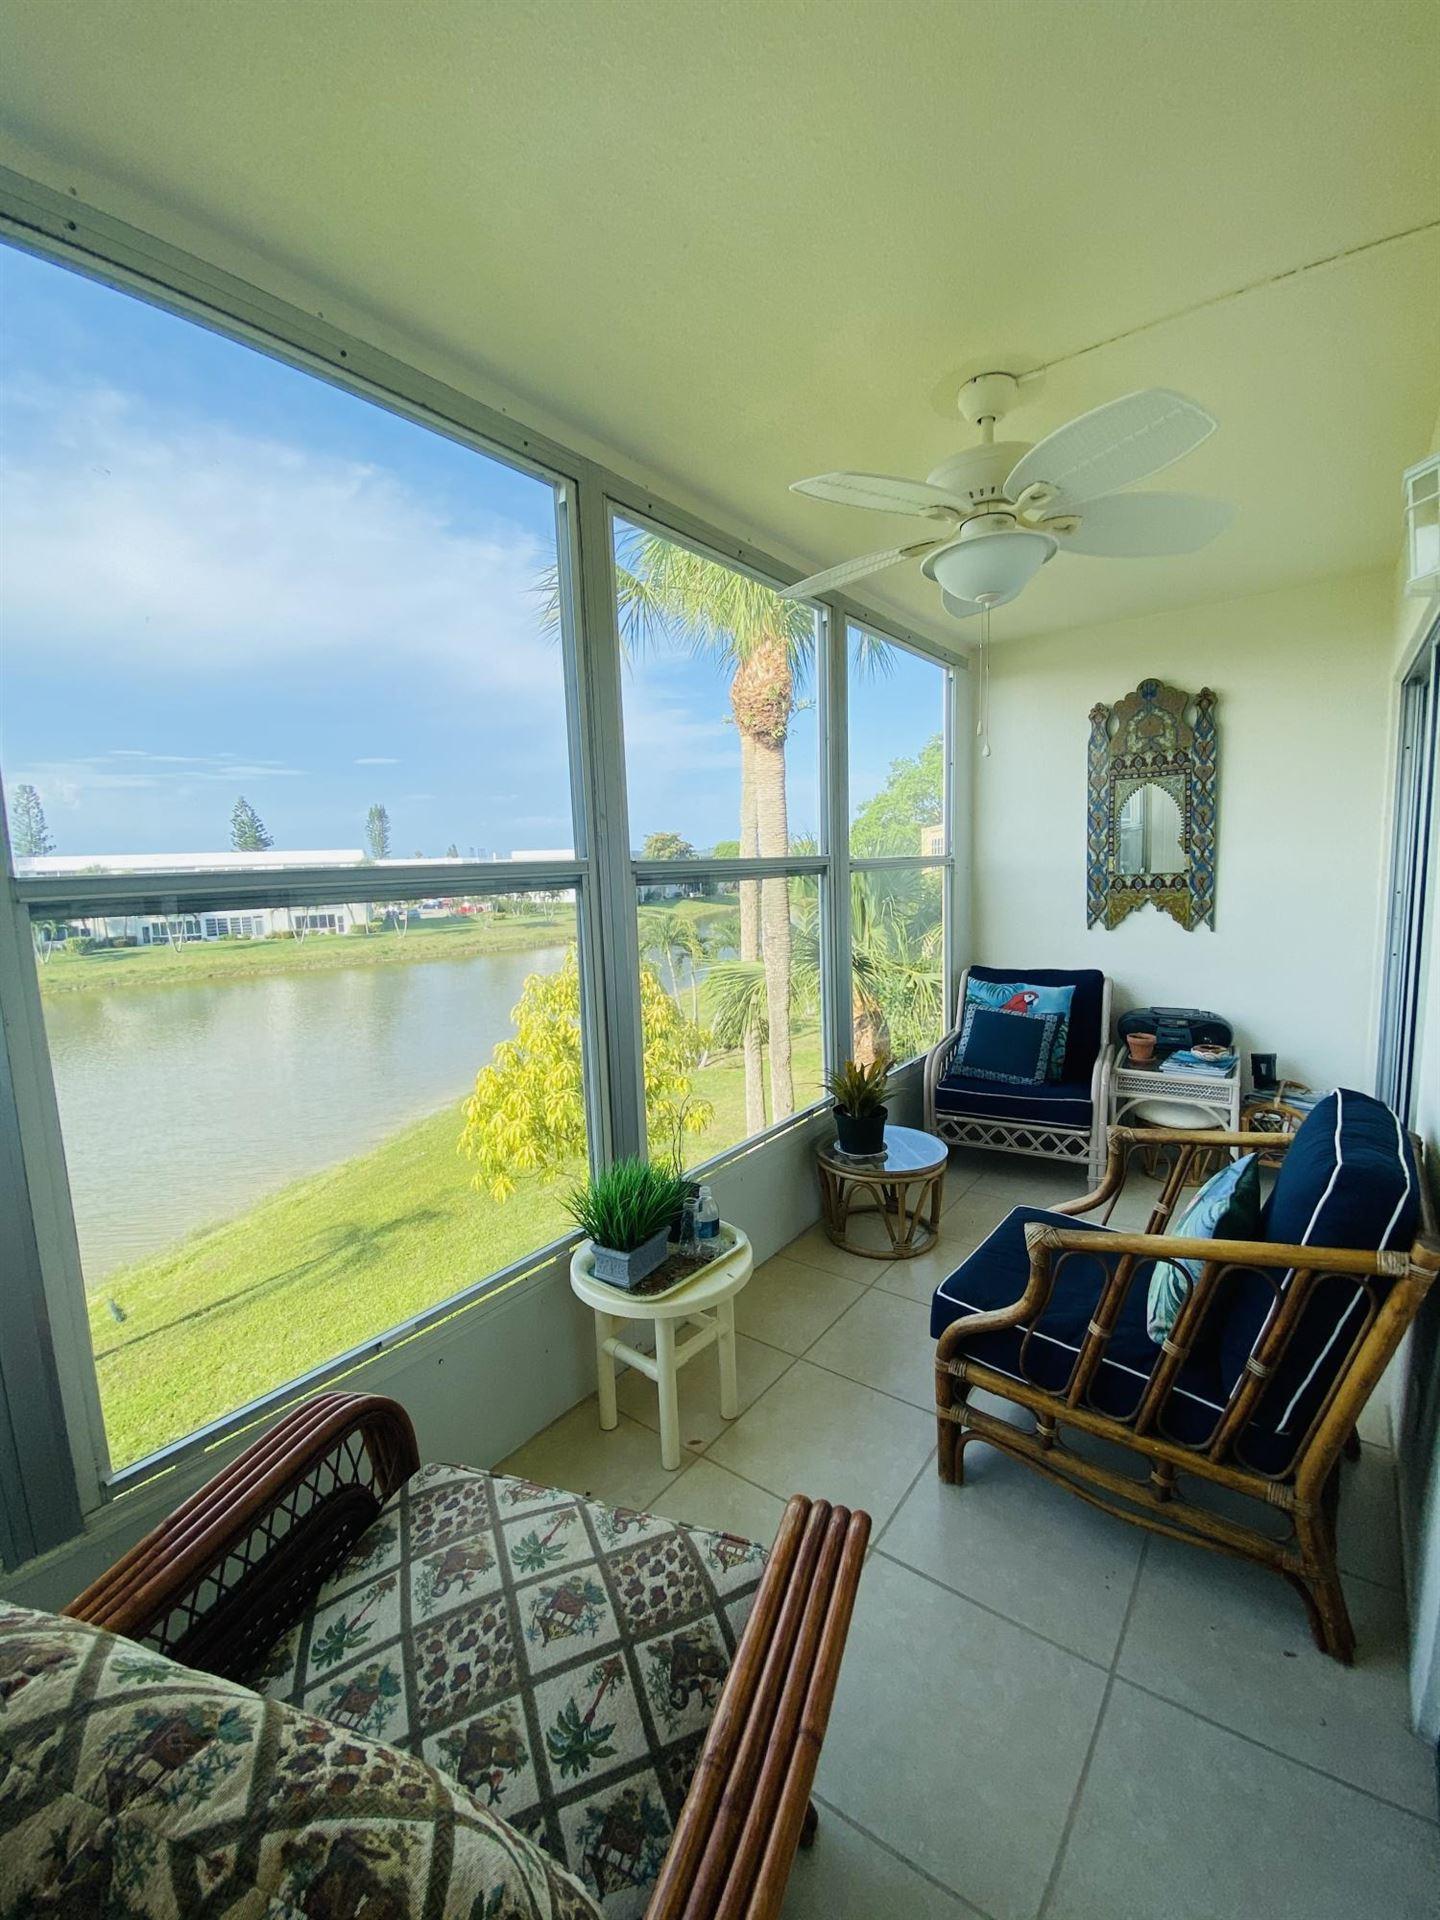 309 Wellington L, West Palm Beach, FL 33417 - MLS#: RX-10714138